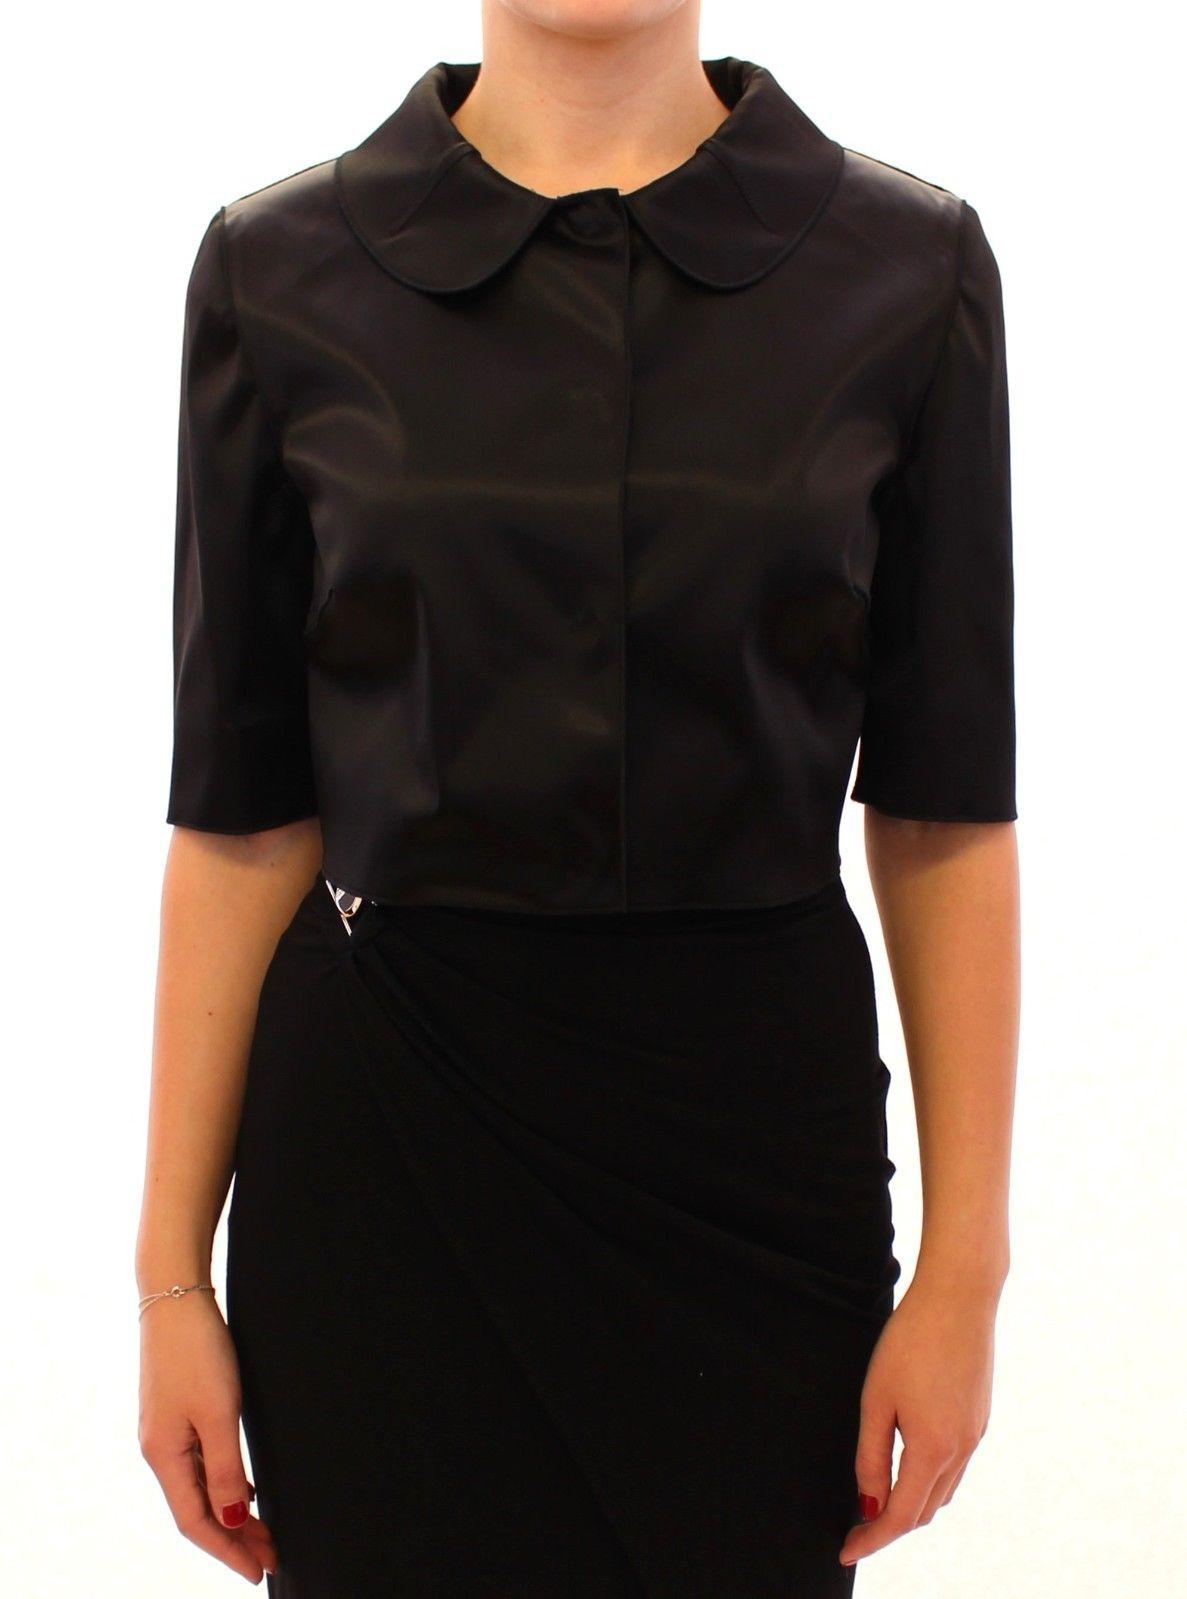 Dolce & Gabbana Women's Shiny Stretch Bolero Shrug Jacket Black GSS11368 - IT46 XL